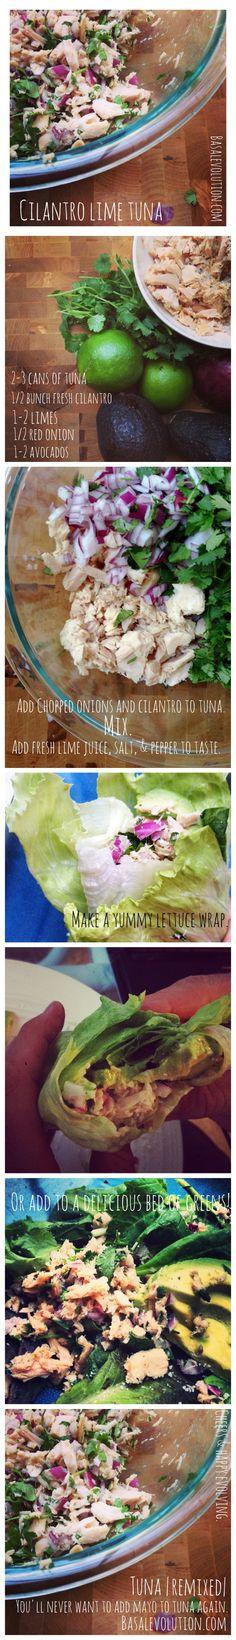 Keto friendly: amazingly delicious tuna recipe (with cilantro and lime) no mayonnaise needed! Cilantro Recipes, Tuna Recipes, Seafood Recipes, Paleo Recipes, Cooking Recipes, I Love Food, Good Food, Yummy Food, Healthy Snacks